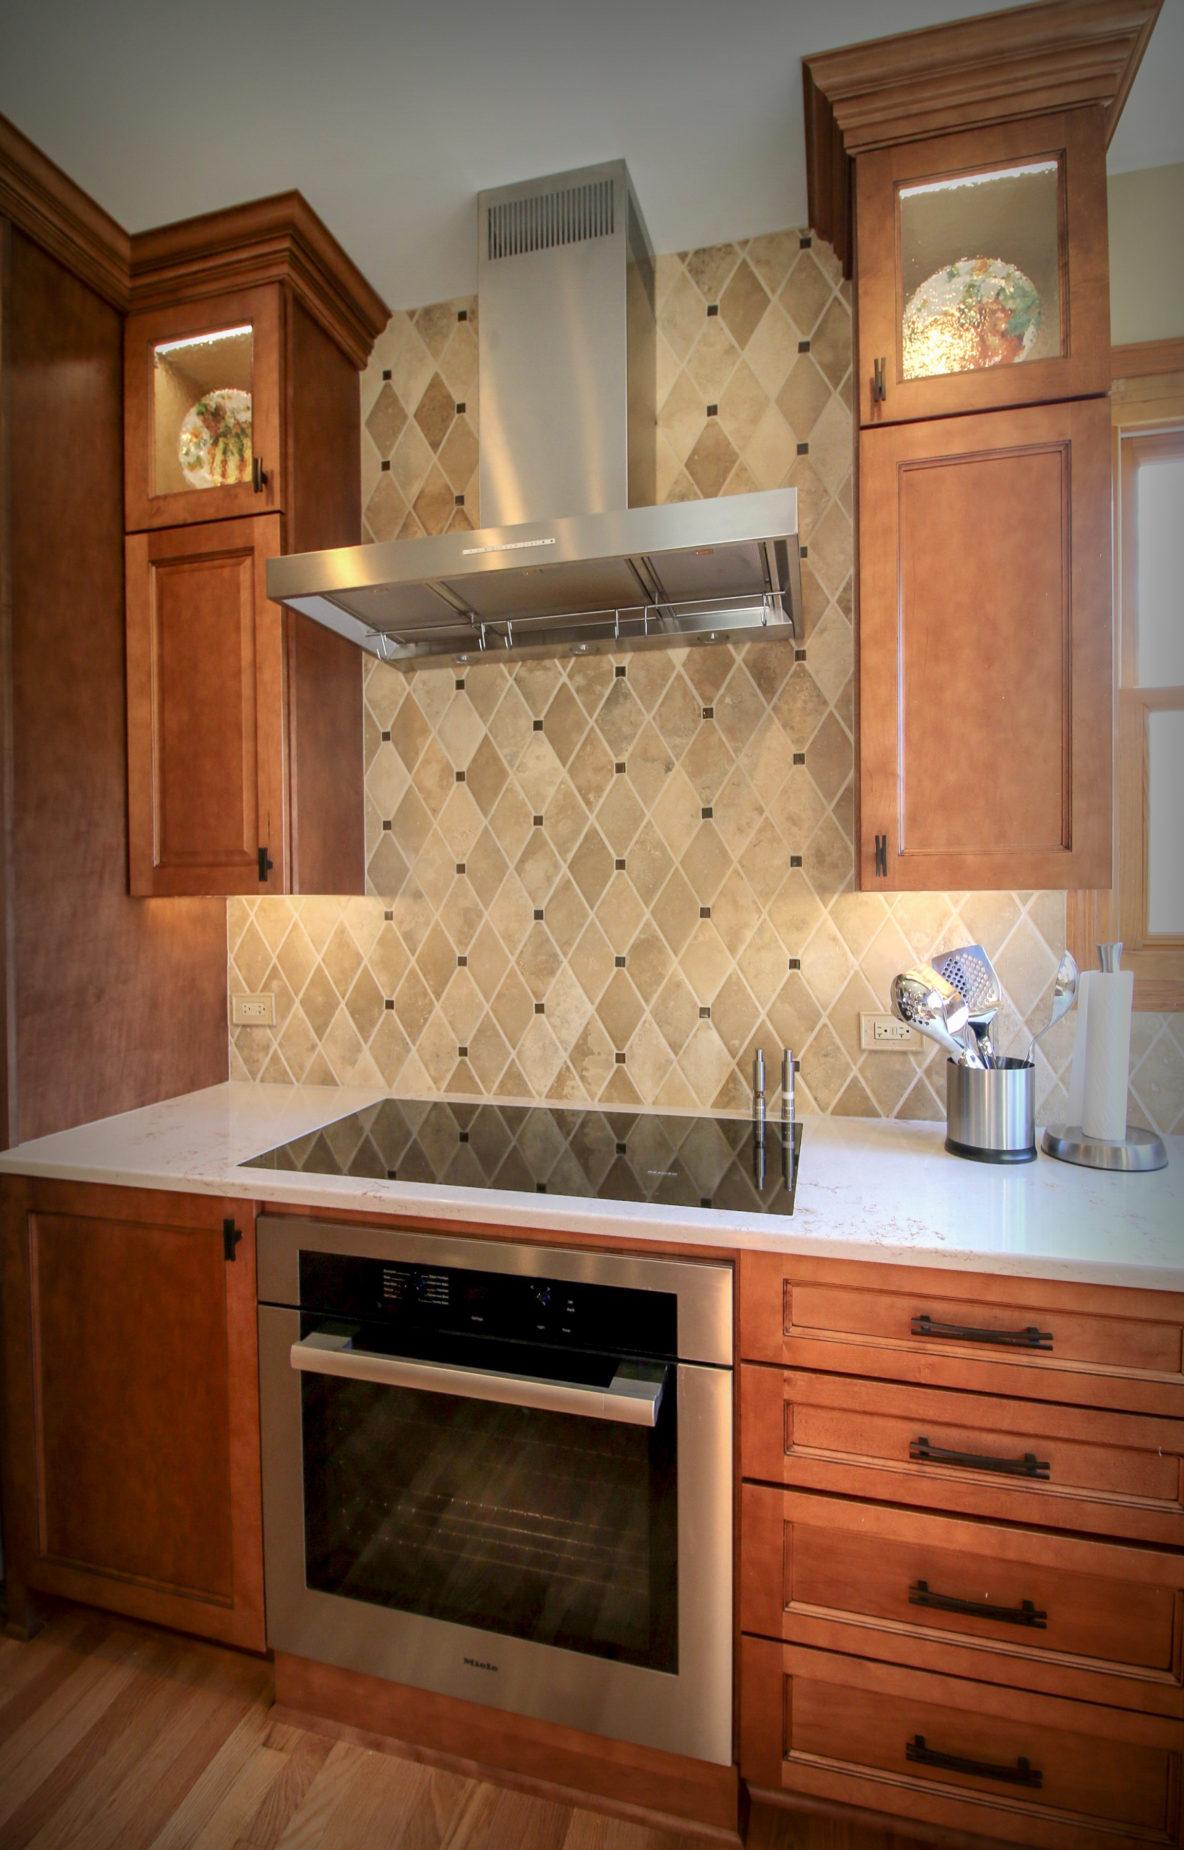 Custom Tile Backsplash in Kitchen Update